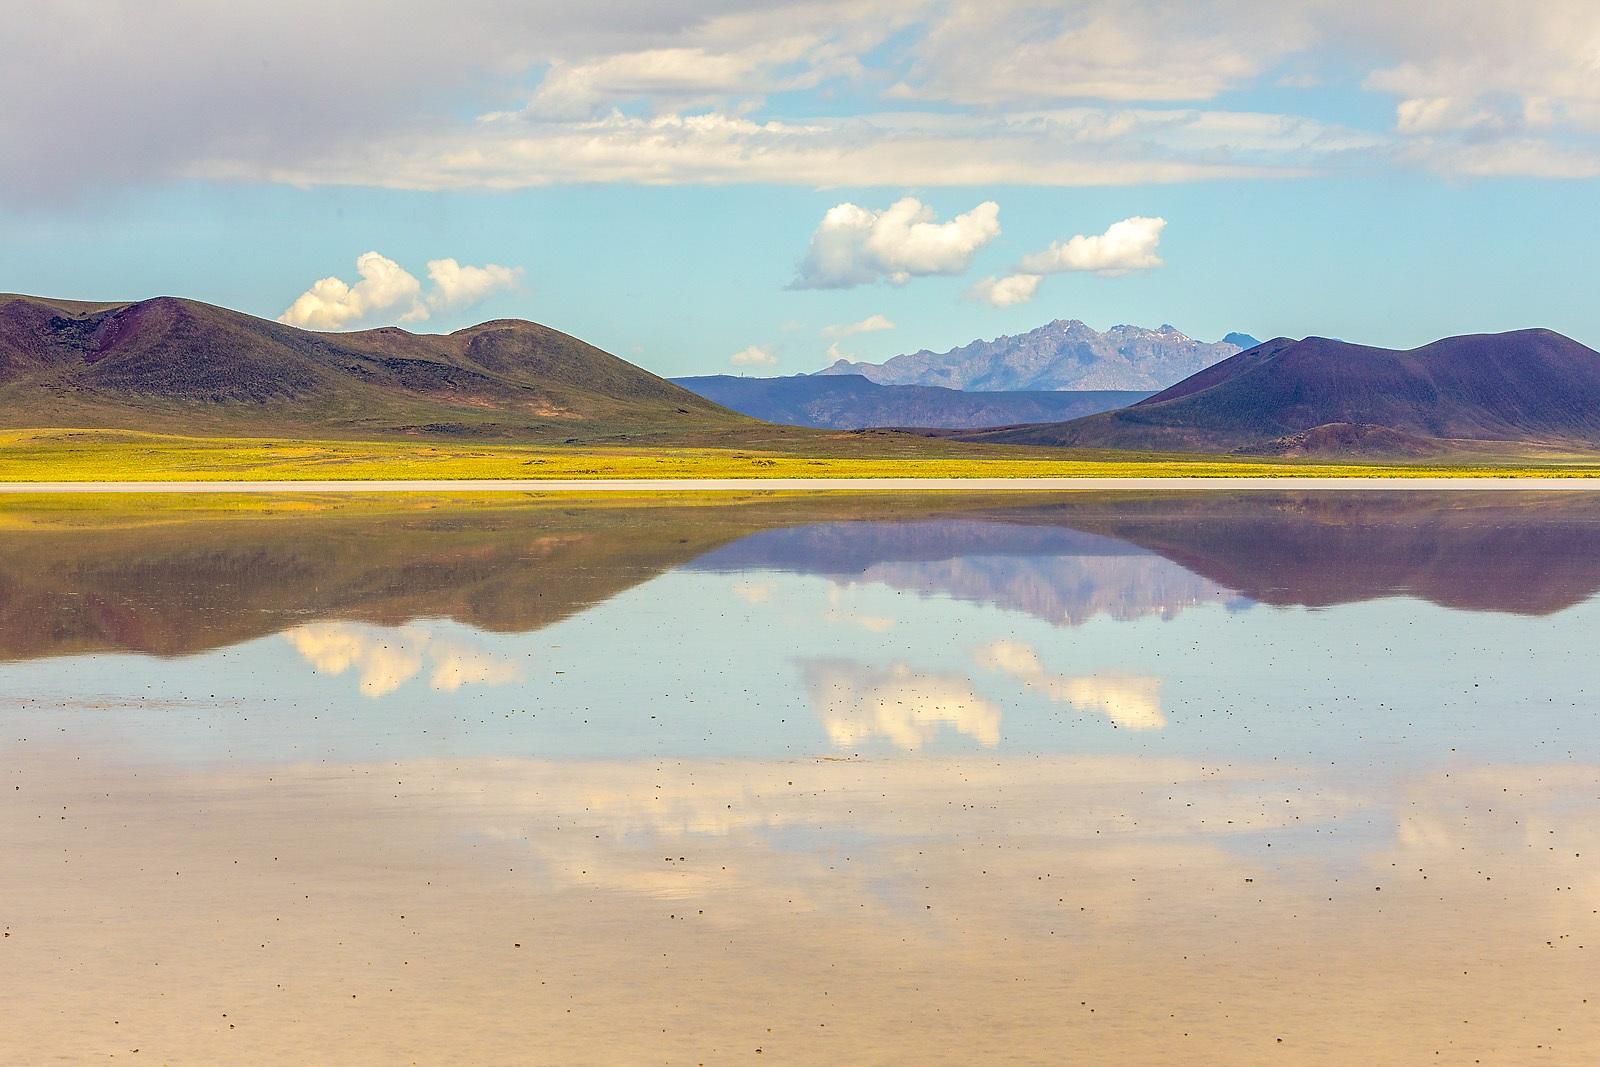 Nevada Scenic Landscape MG 1241 v2b  Lunar Lake